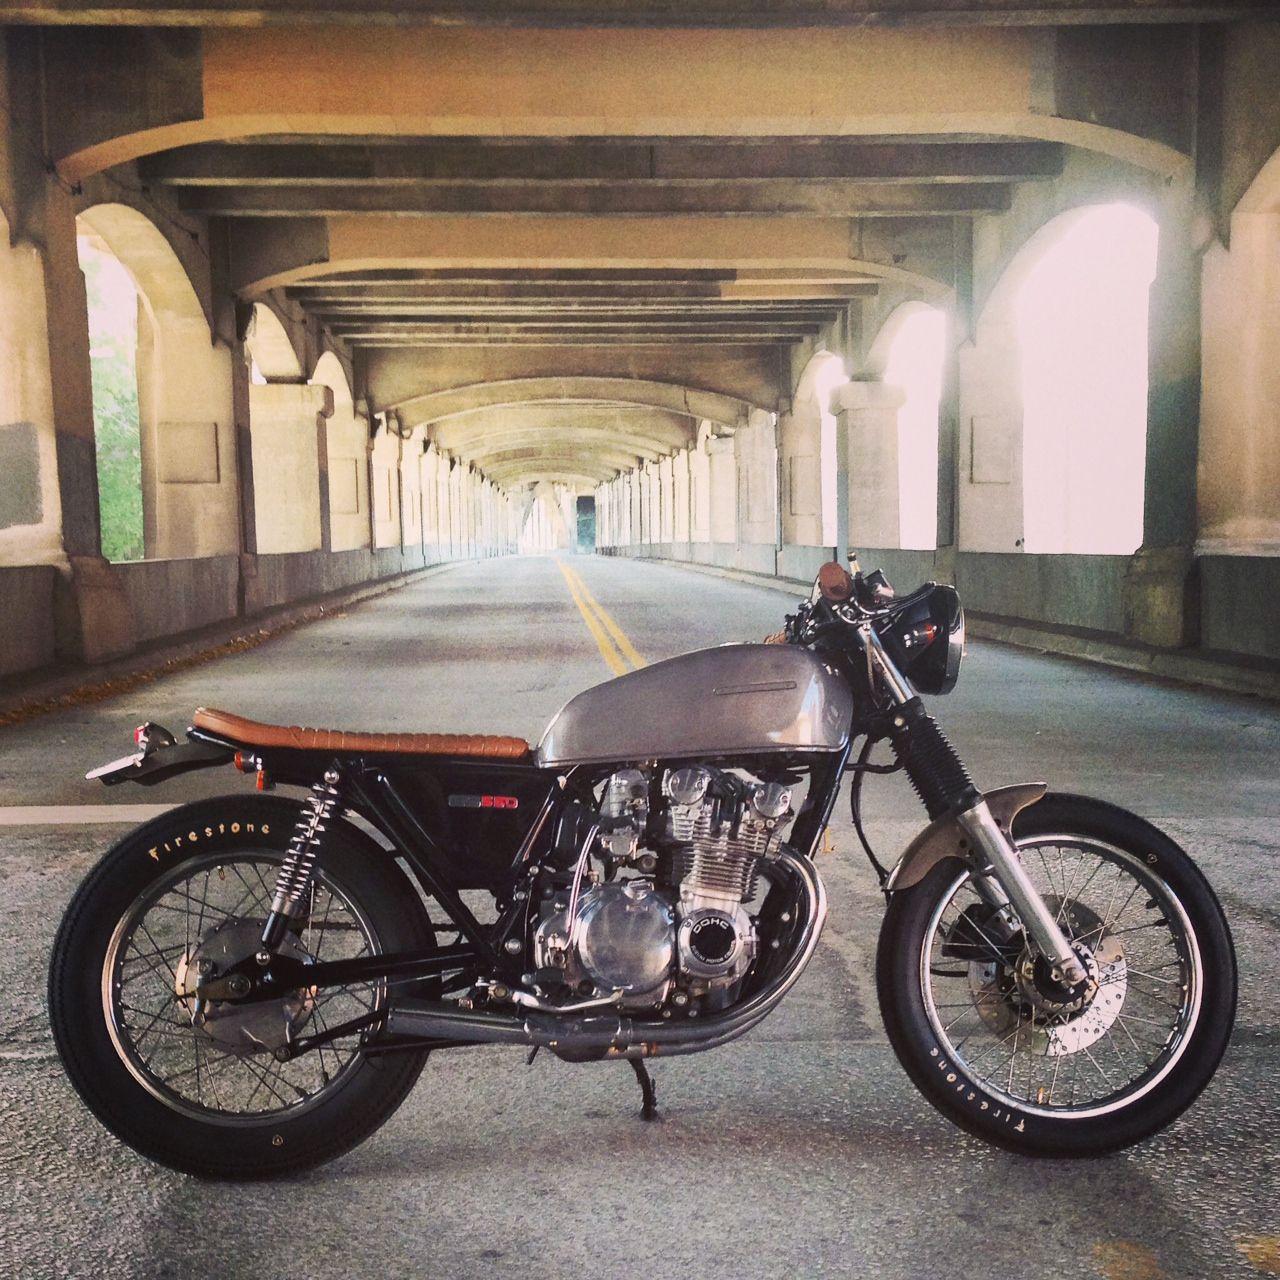 1977 Suzuki Gs550 Custom Bikes Cafe Racers Cafe Racer Motorcycle Suzuki Cafe Racer [ 1280 x 1280 Pixel ]